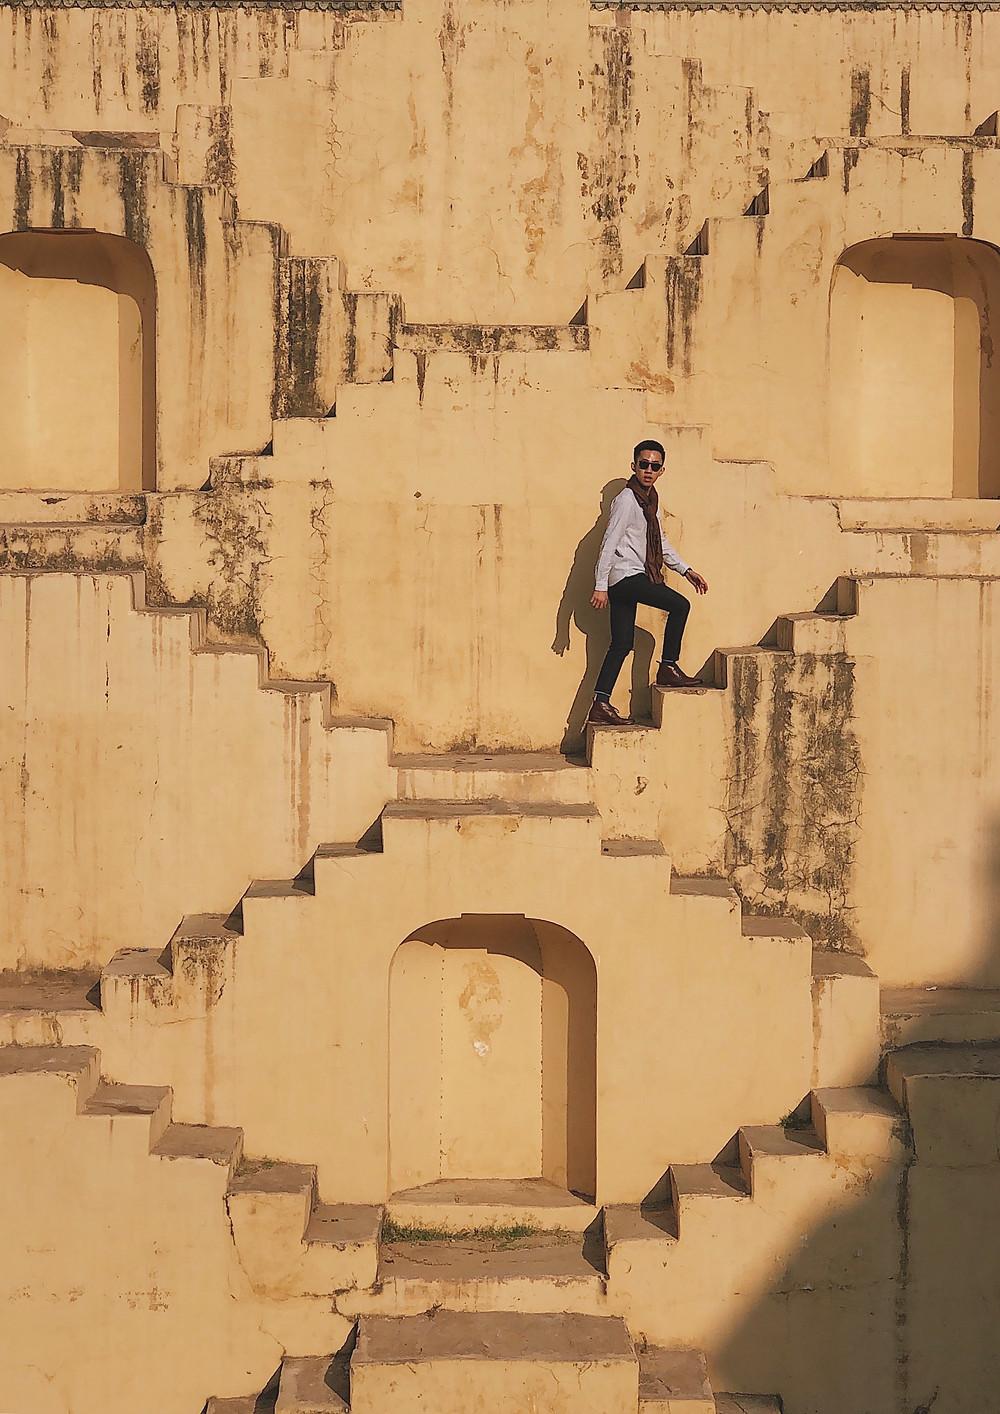 Panna Meena Ka Kund is a stepwell in Jaipur, Rajasthan, India